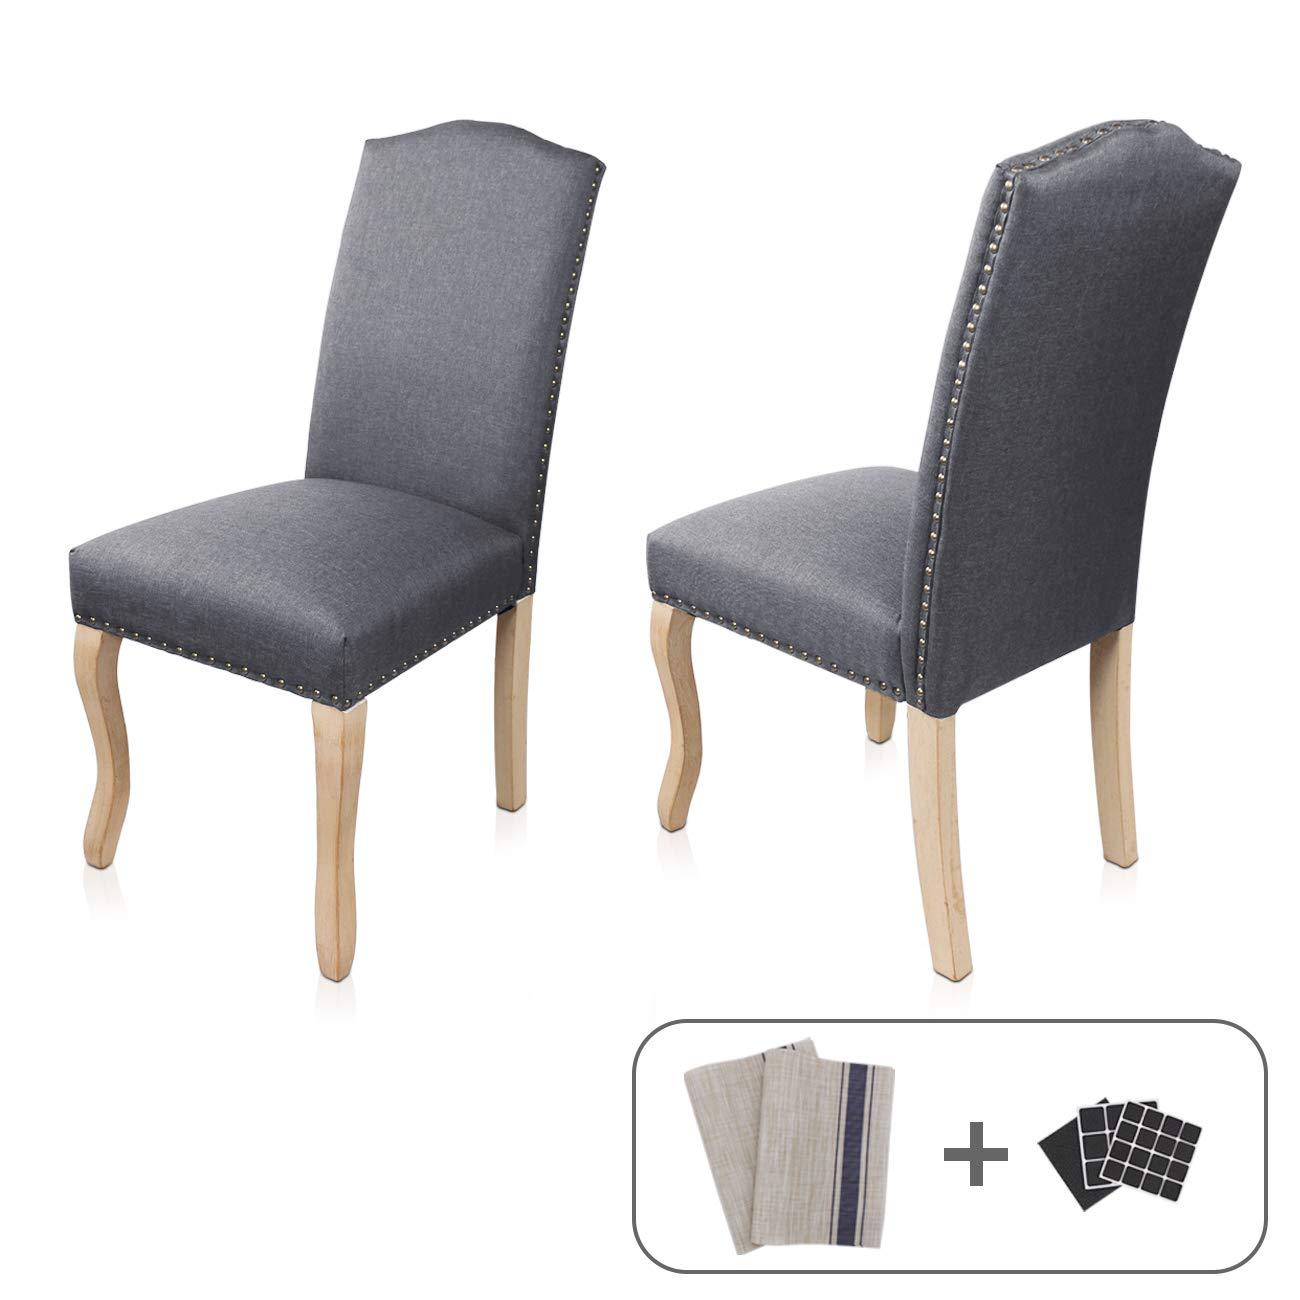 Amazoncom Dining Chairs Set Of 2 Aodailihb Solid Wood High Back